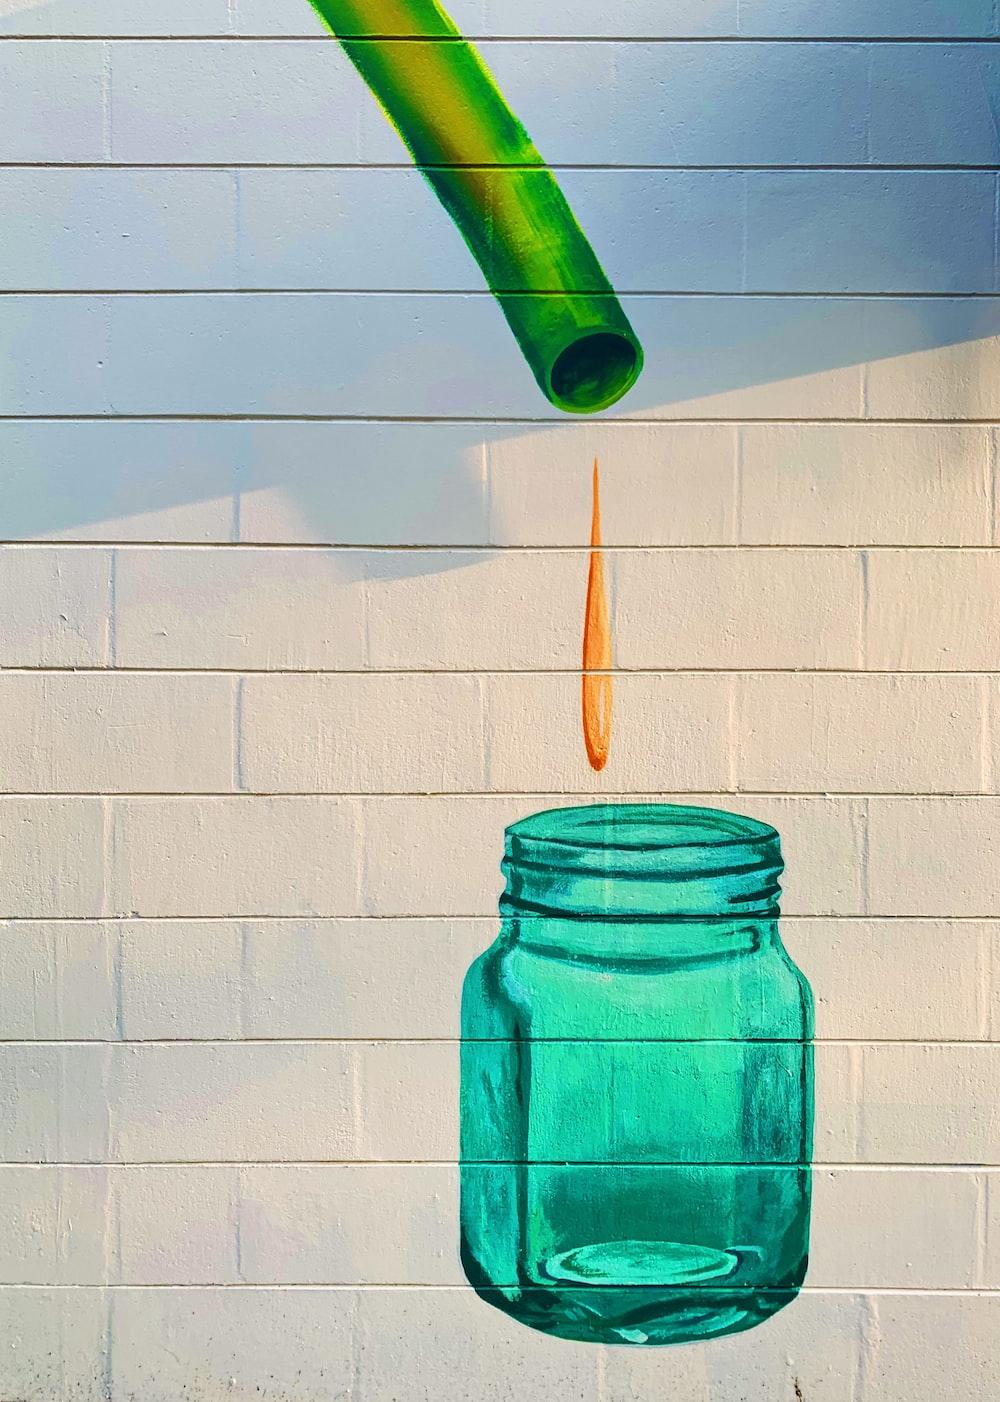 teal printed jar on concrete wall